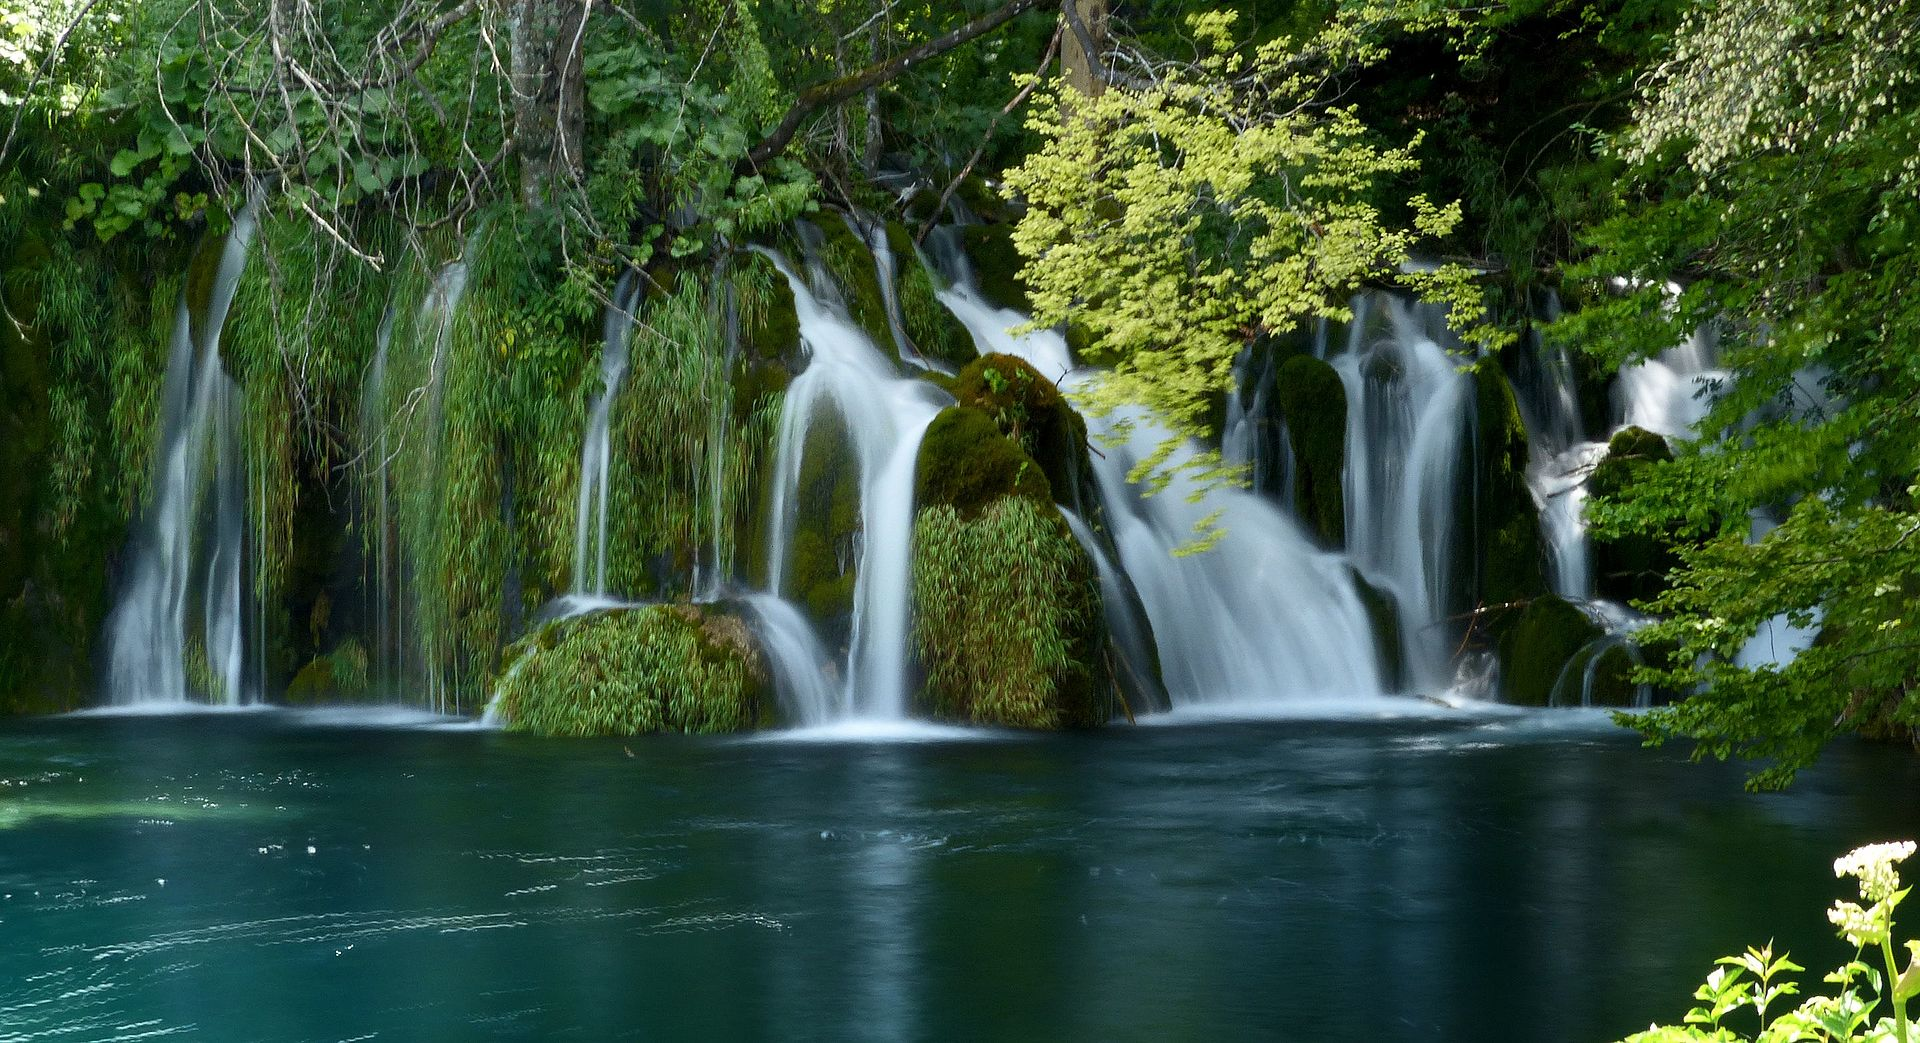 1920px-006_-_19-07-16_-_kroatien_-_plitvicka_jezera